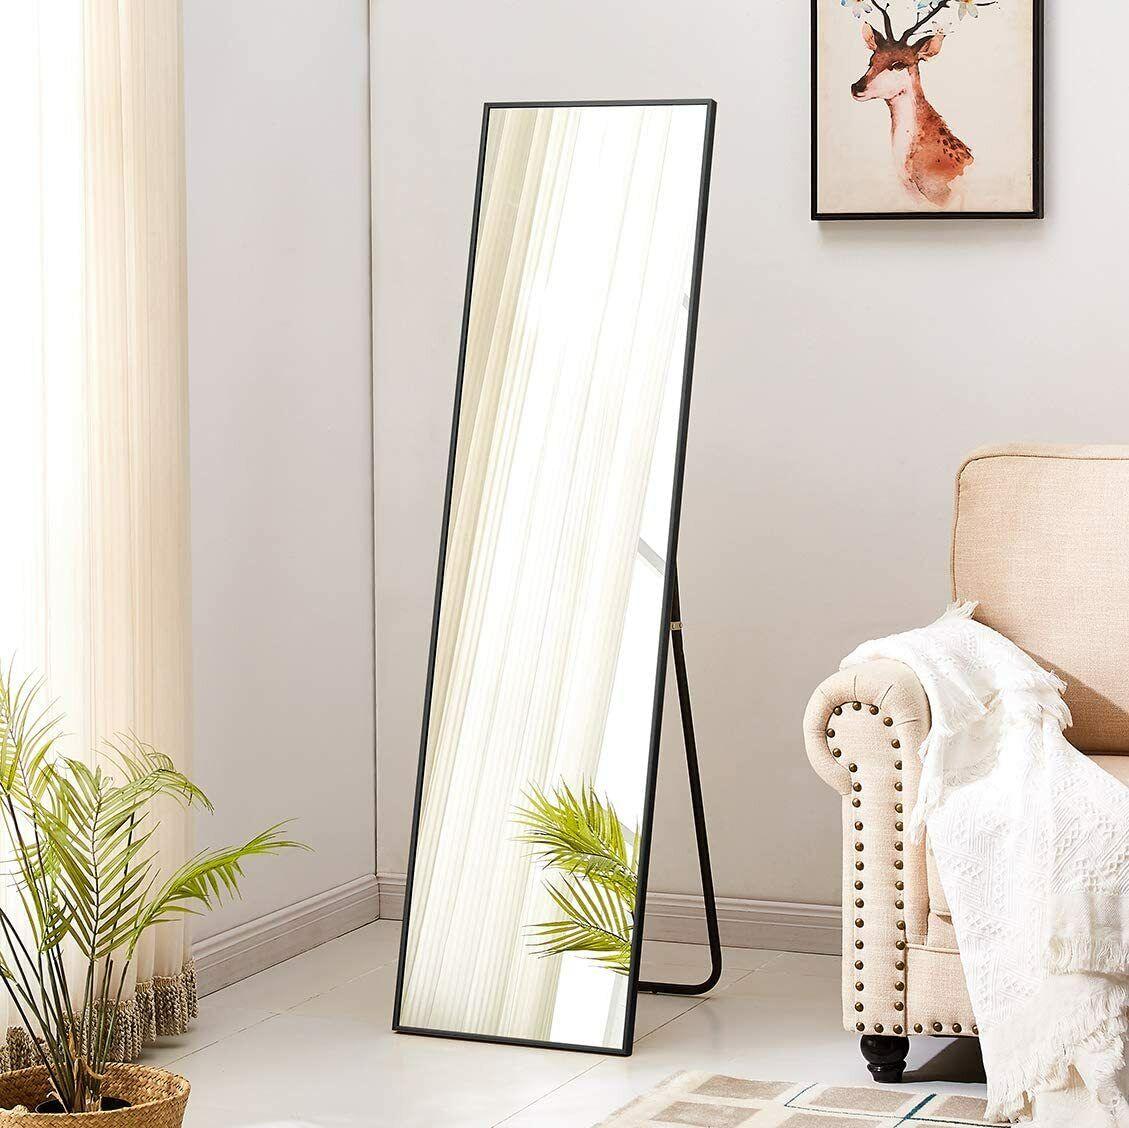 Full Length Standing Mirror Home Hallway Dressing Decor Glass Wall For Sale Online Ebay